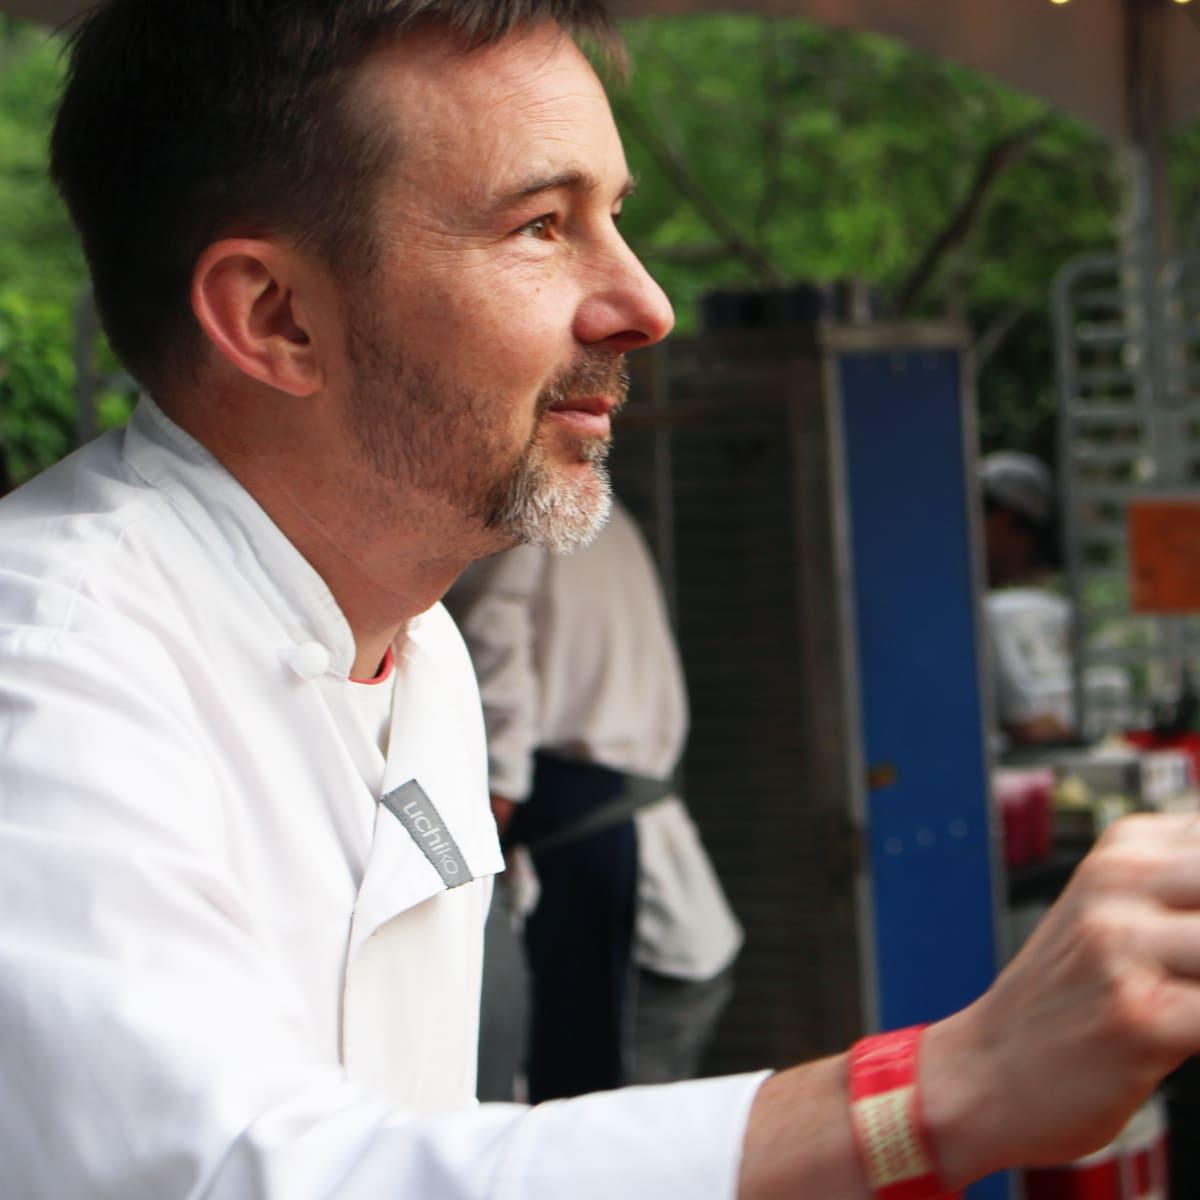 Austin Food and Wine Fest 2017 Tyson Cole